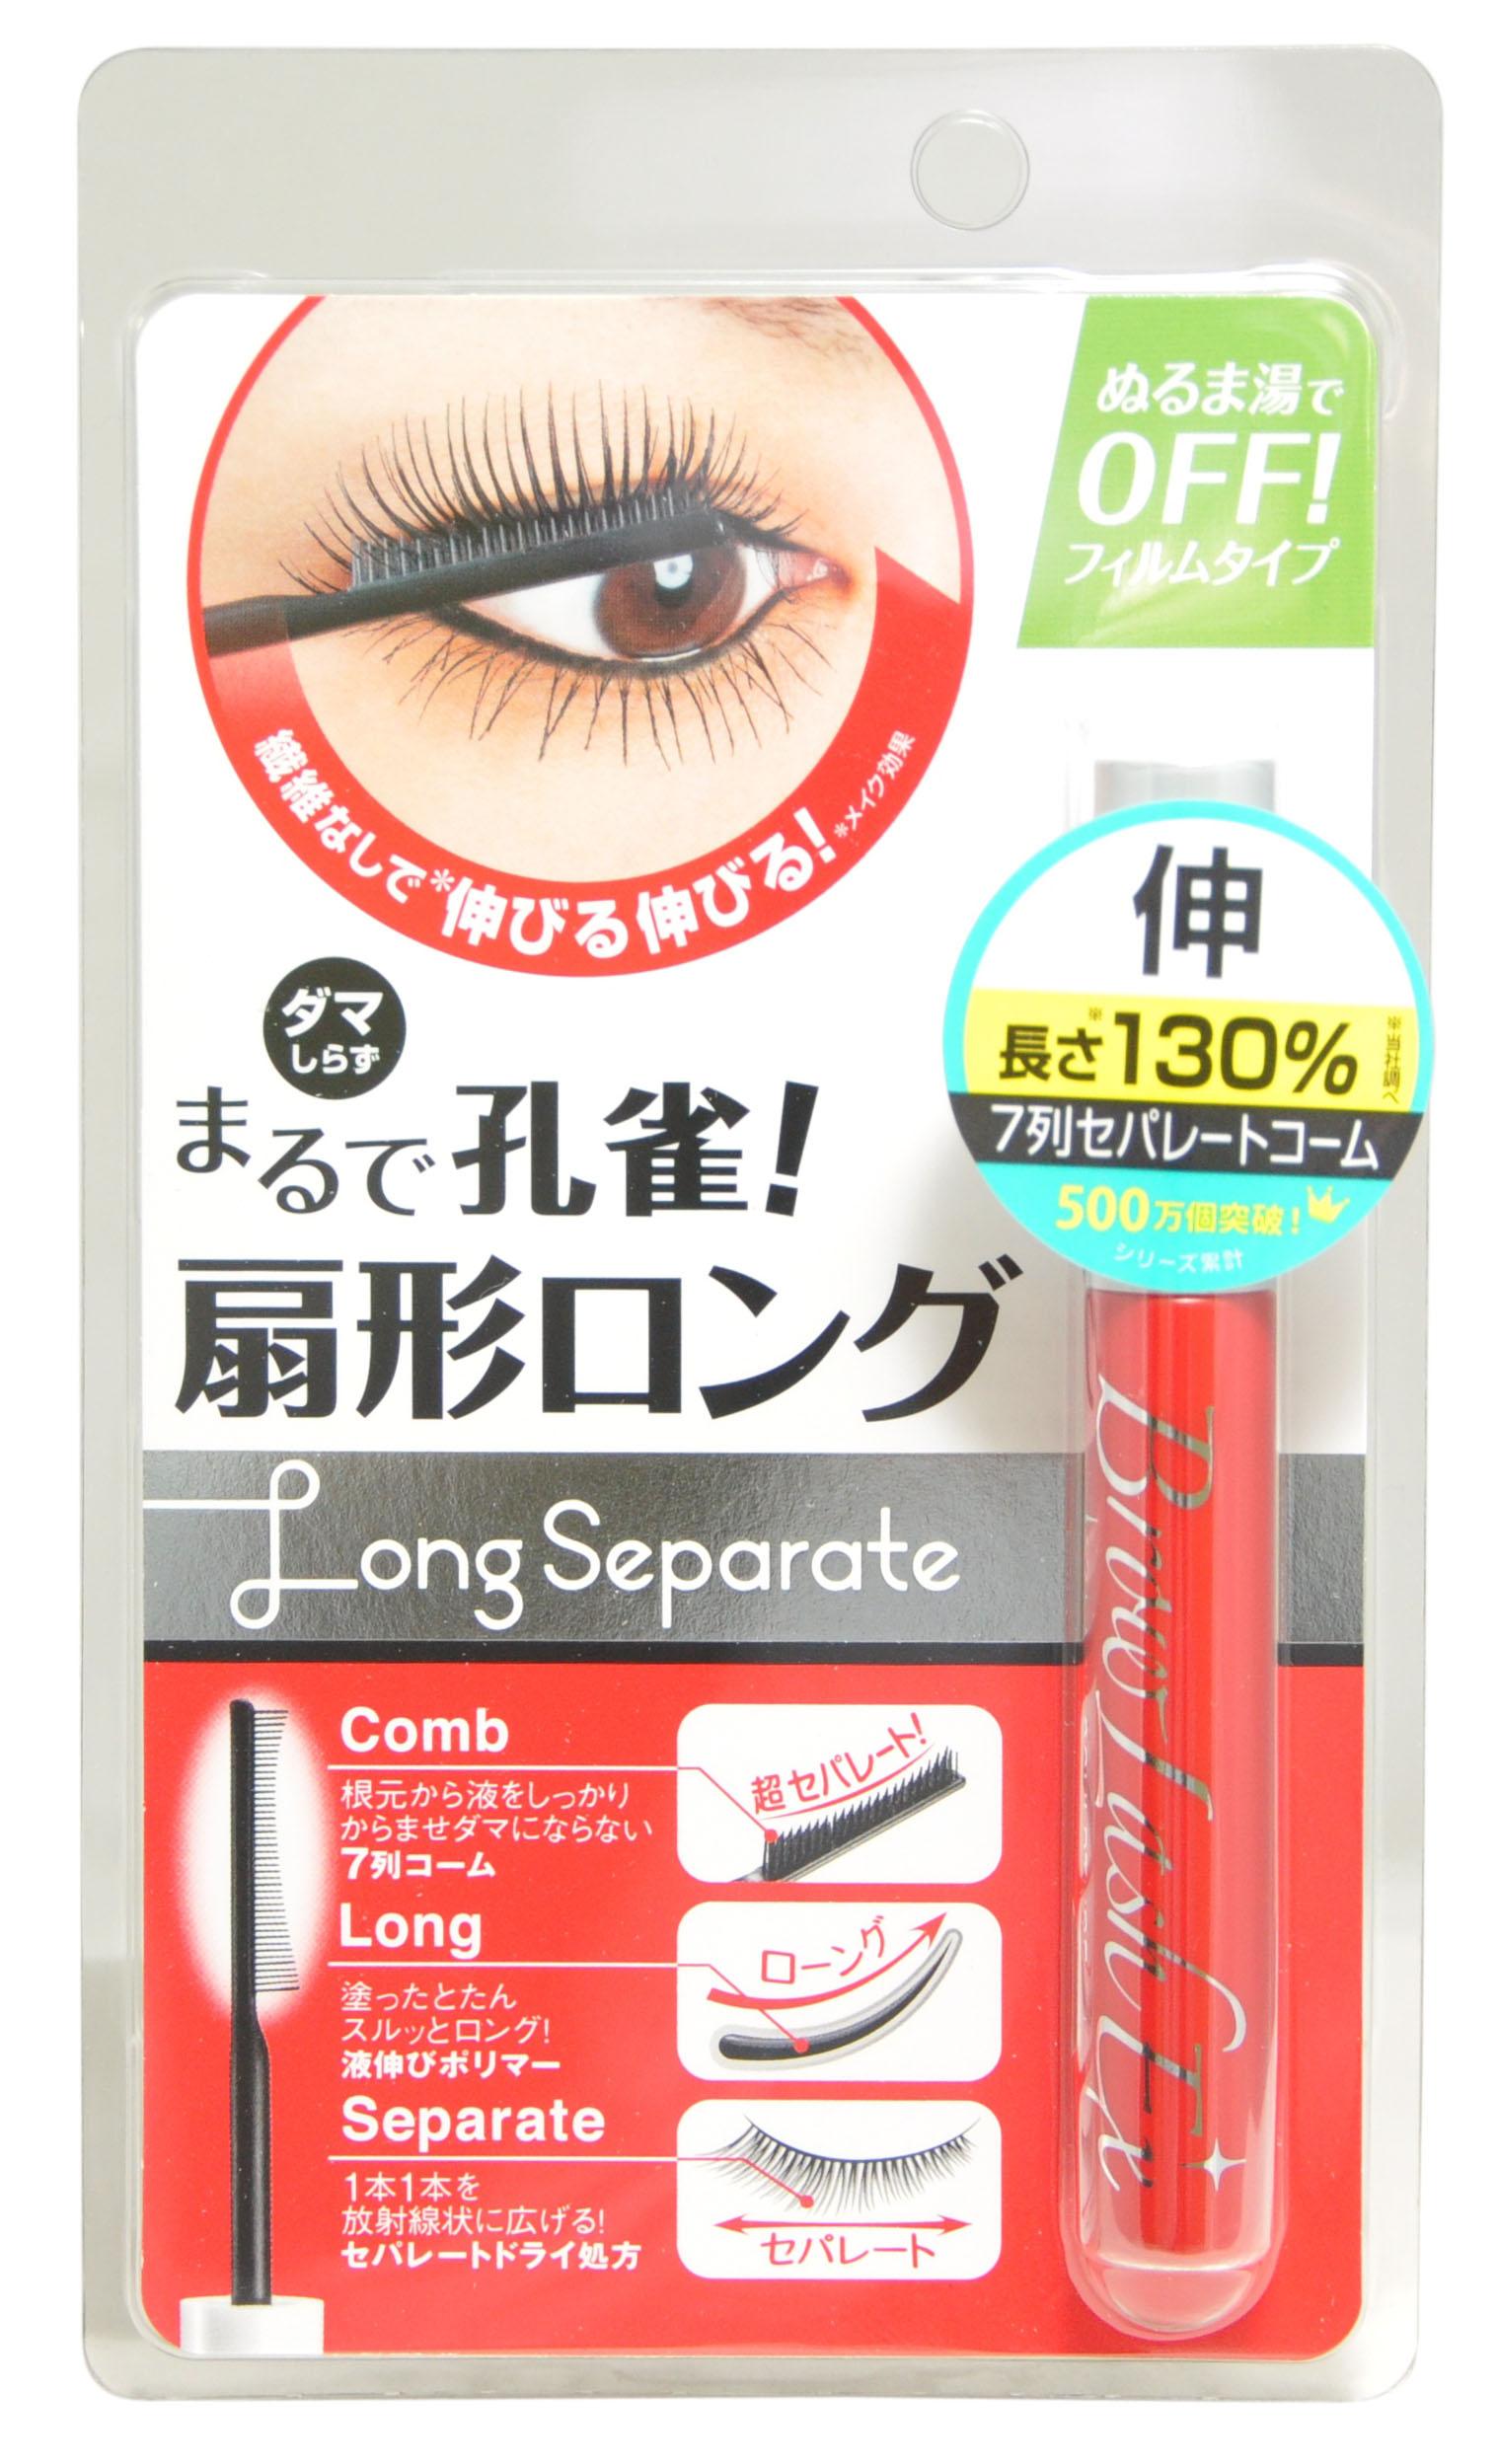 BCL Brow Lash Mascara Тушь для ресниц (удлиняющая 130%) тушь для ресниц wonder lash artdeco